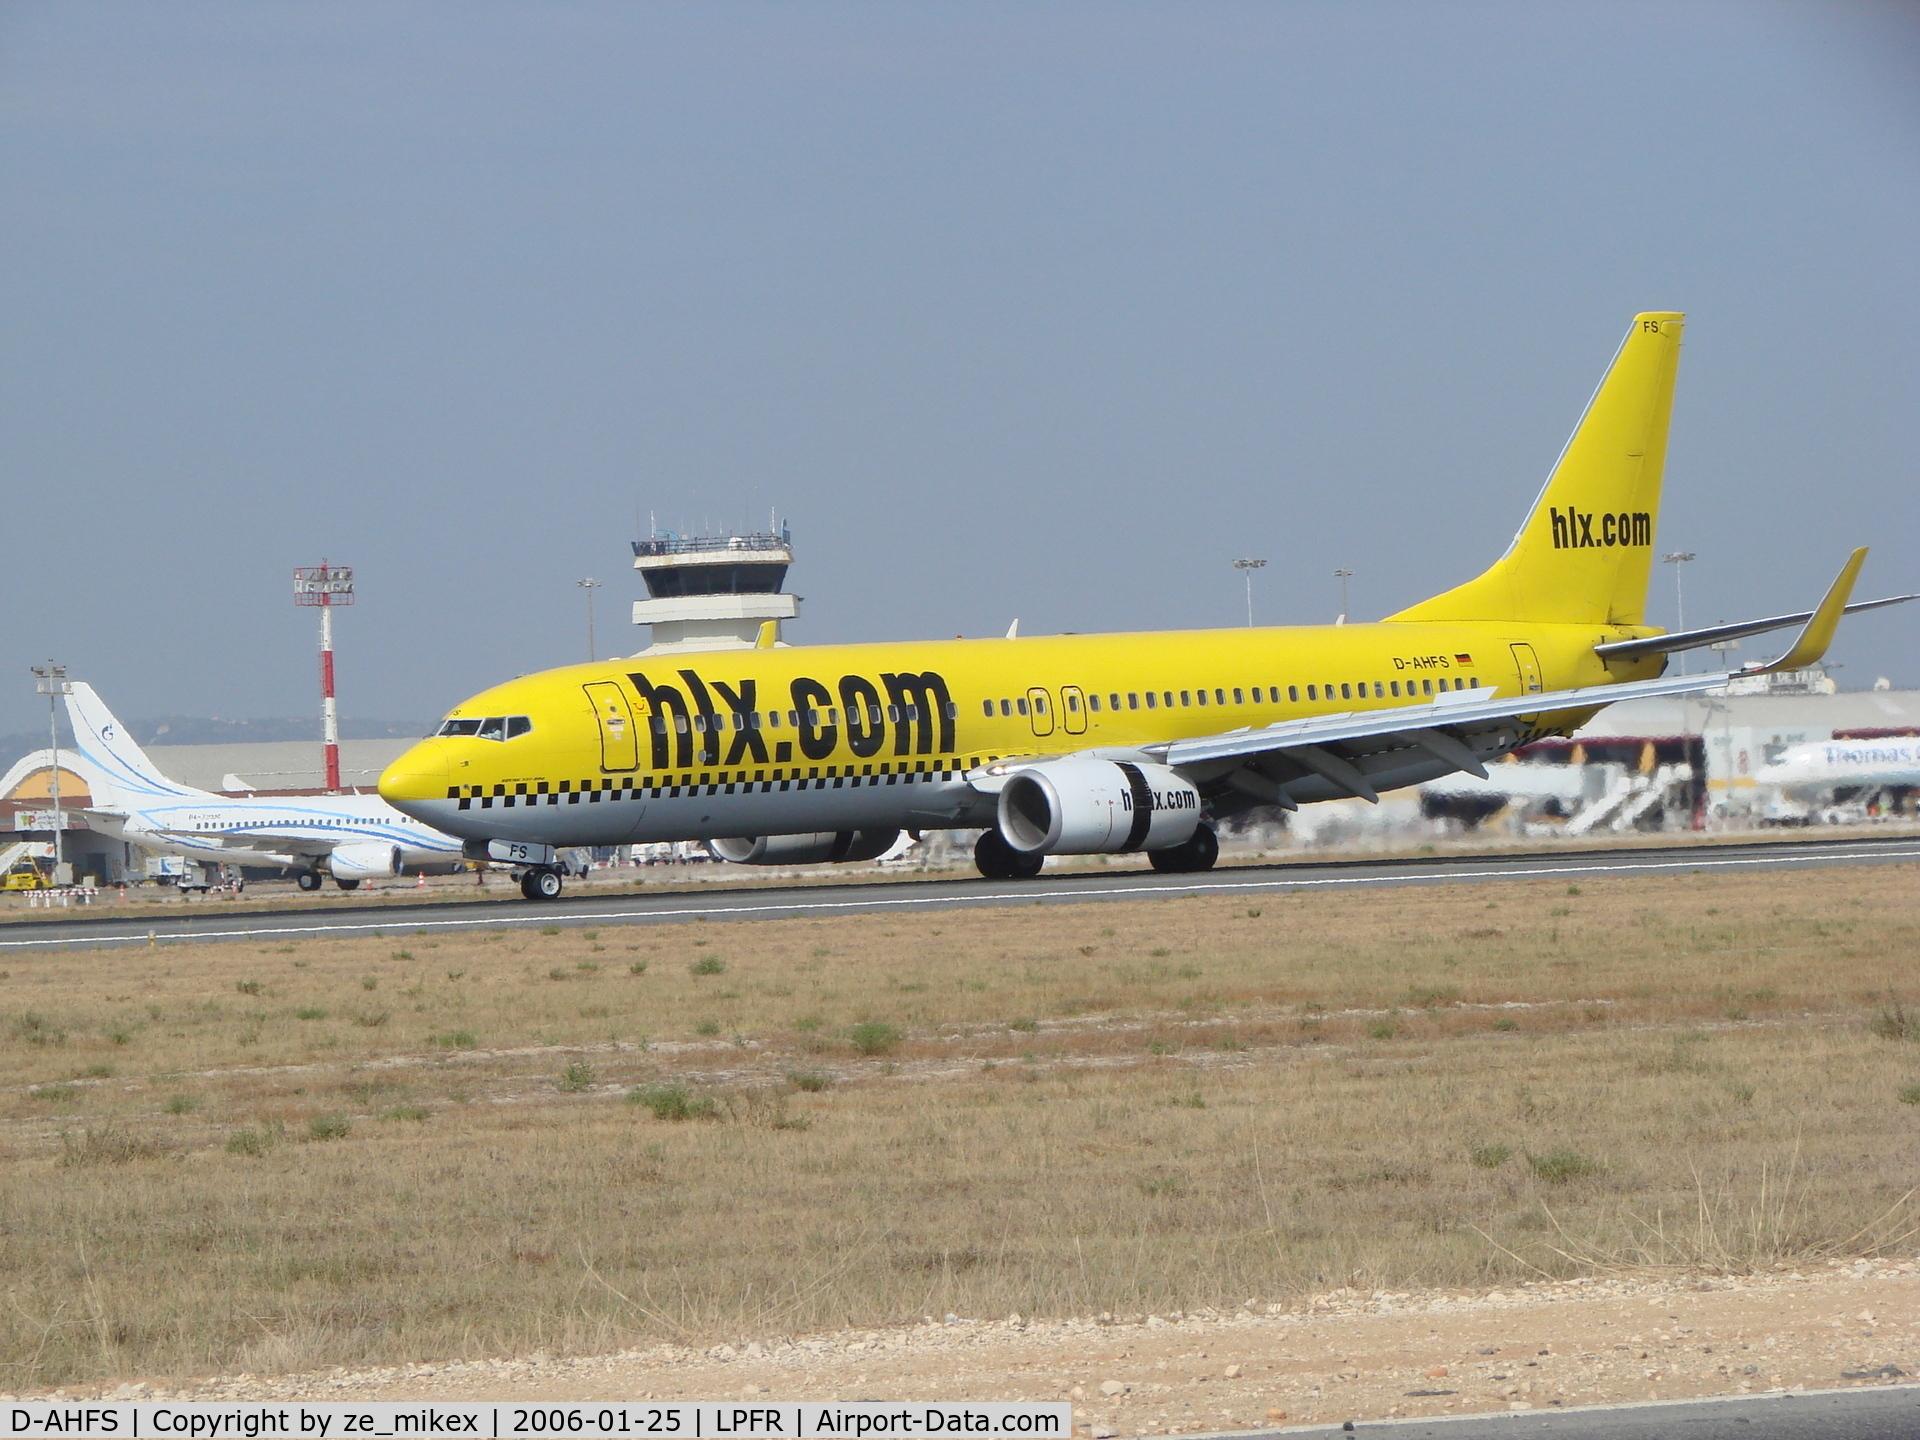 D-AHFS, 2000 Boeing 737-8K5 C/N 28623, b-737 at Faro airport